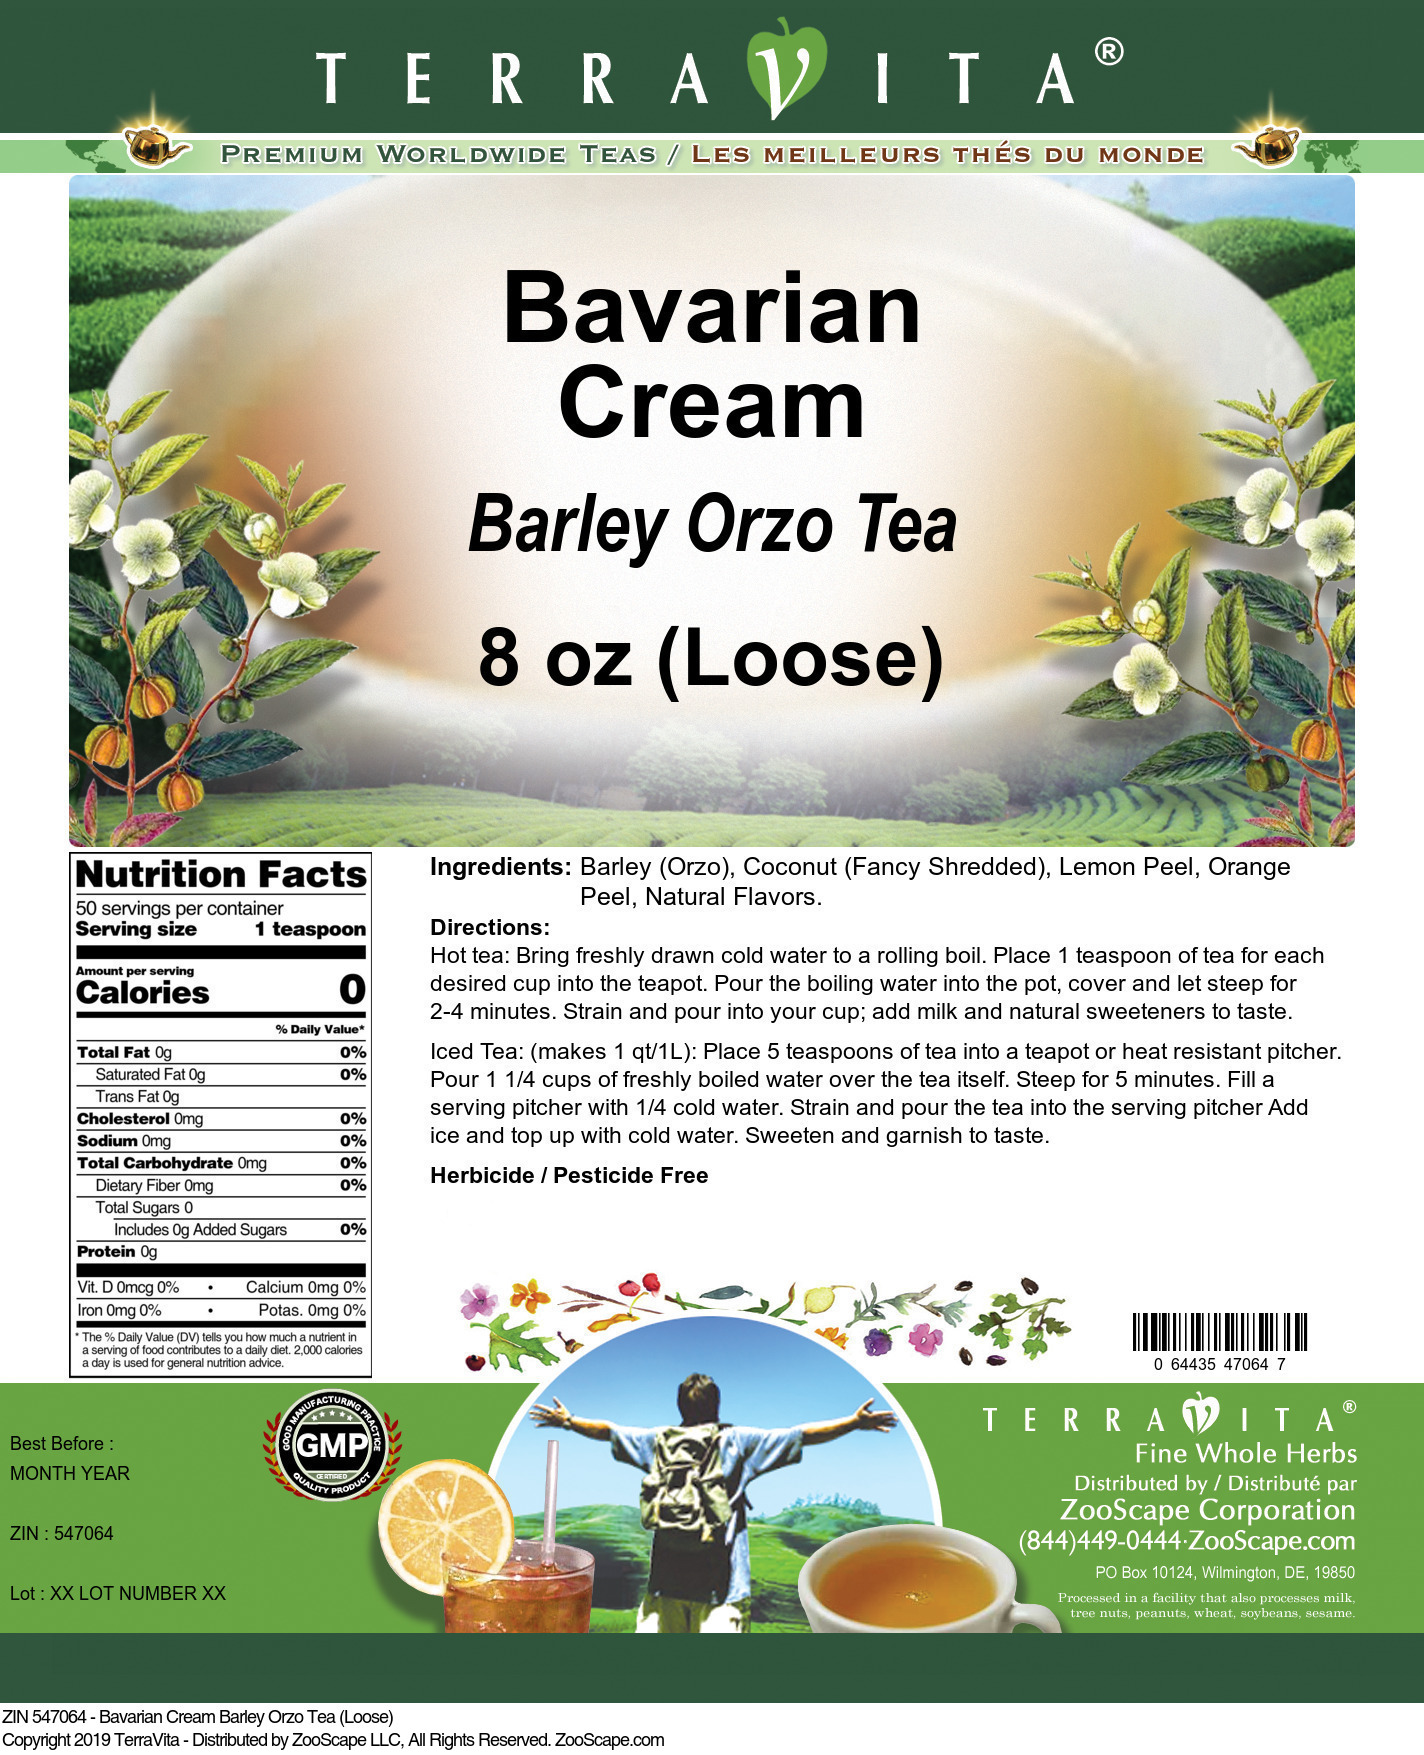 Bavarian Cream Barley Orzo Tea (Loose)